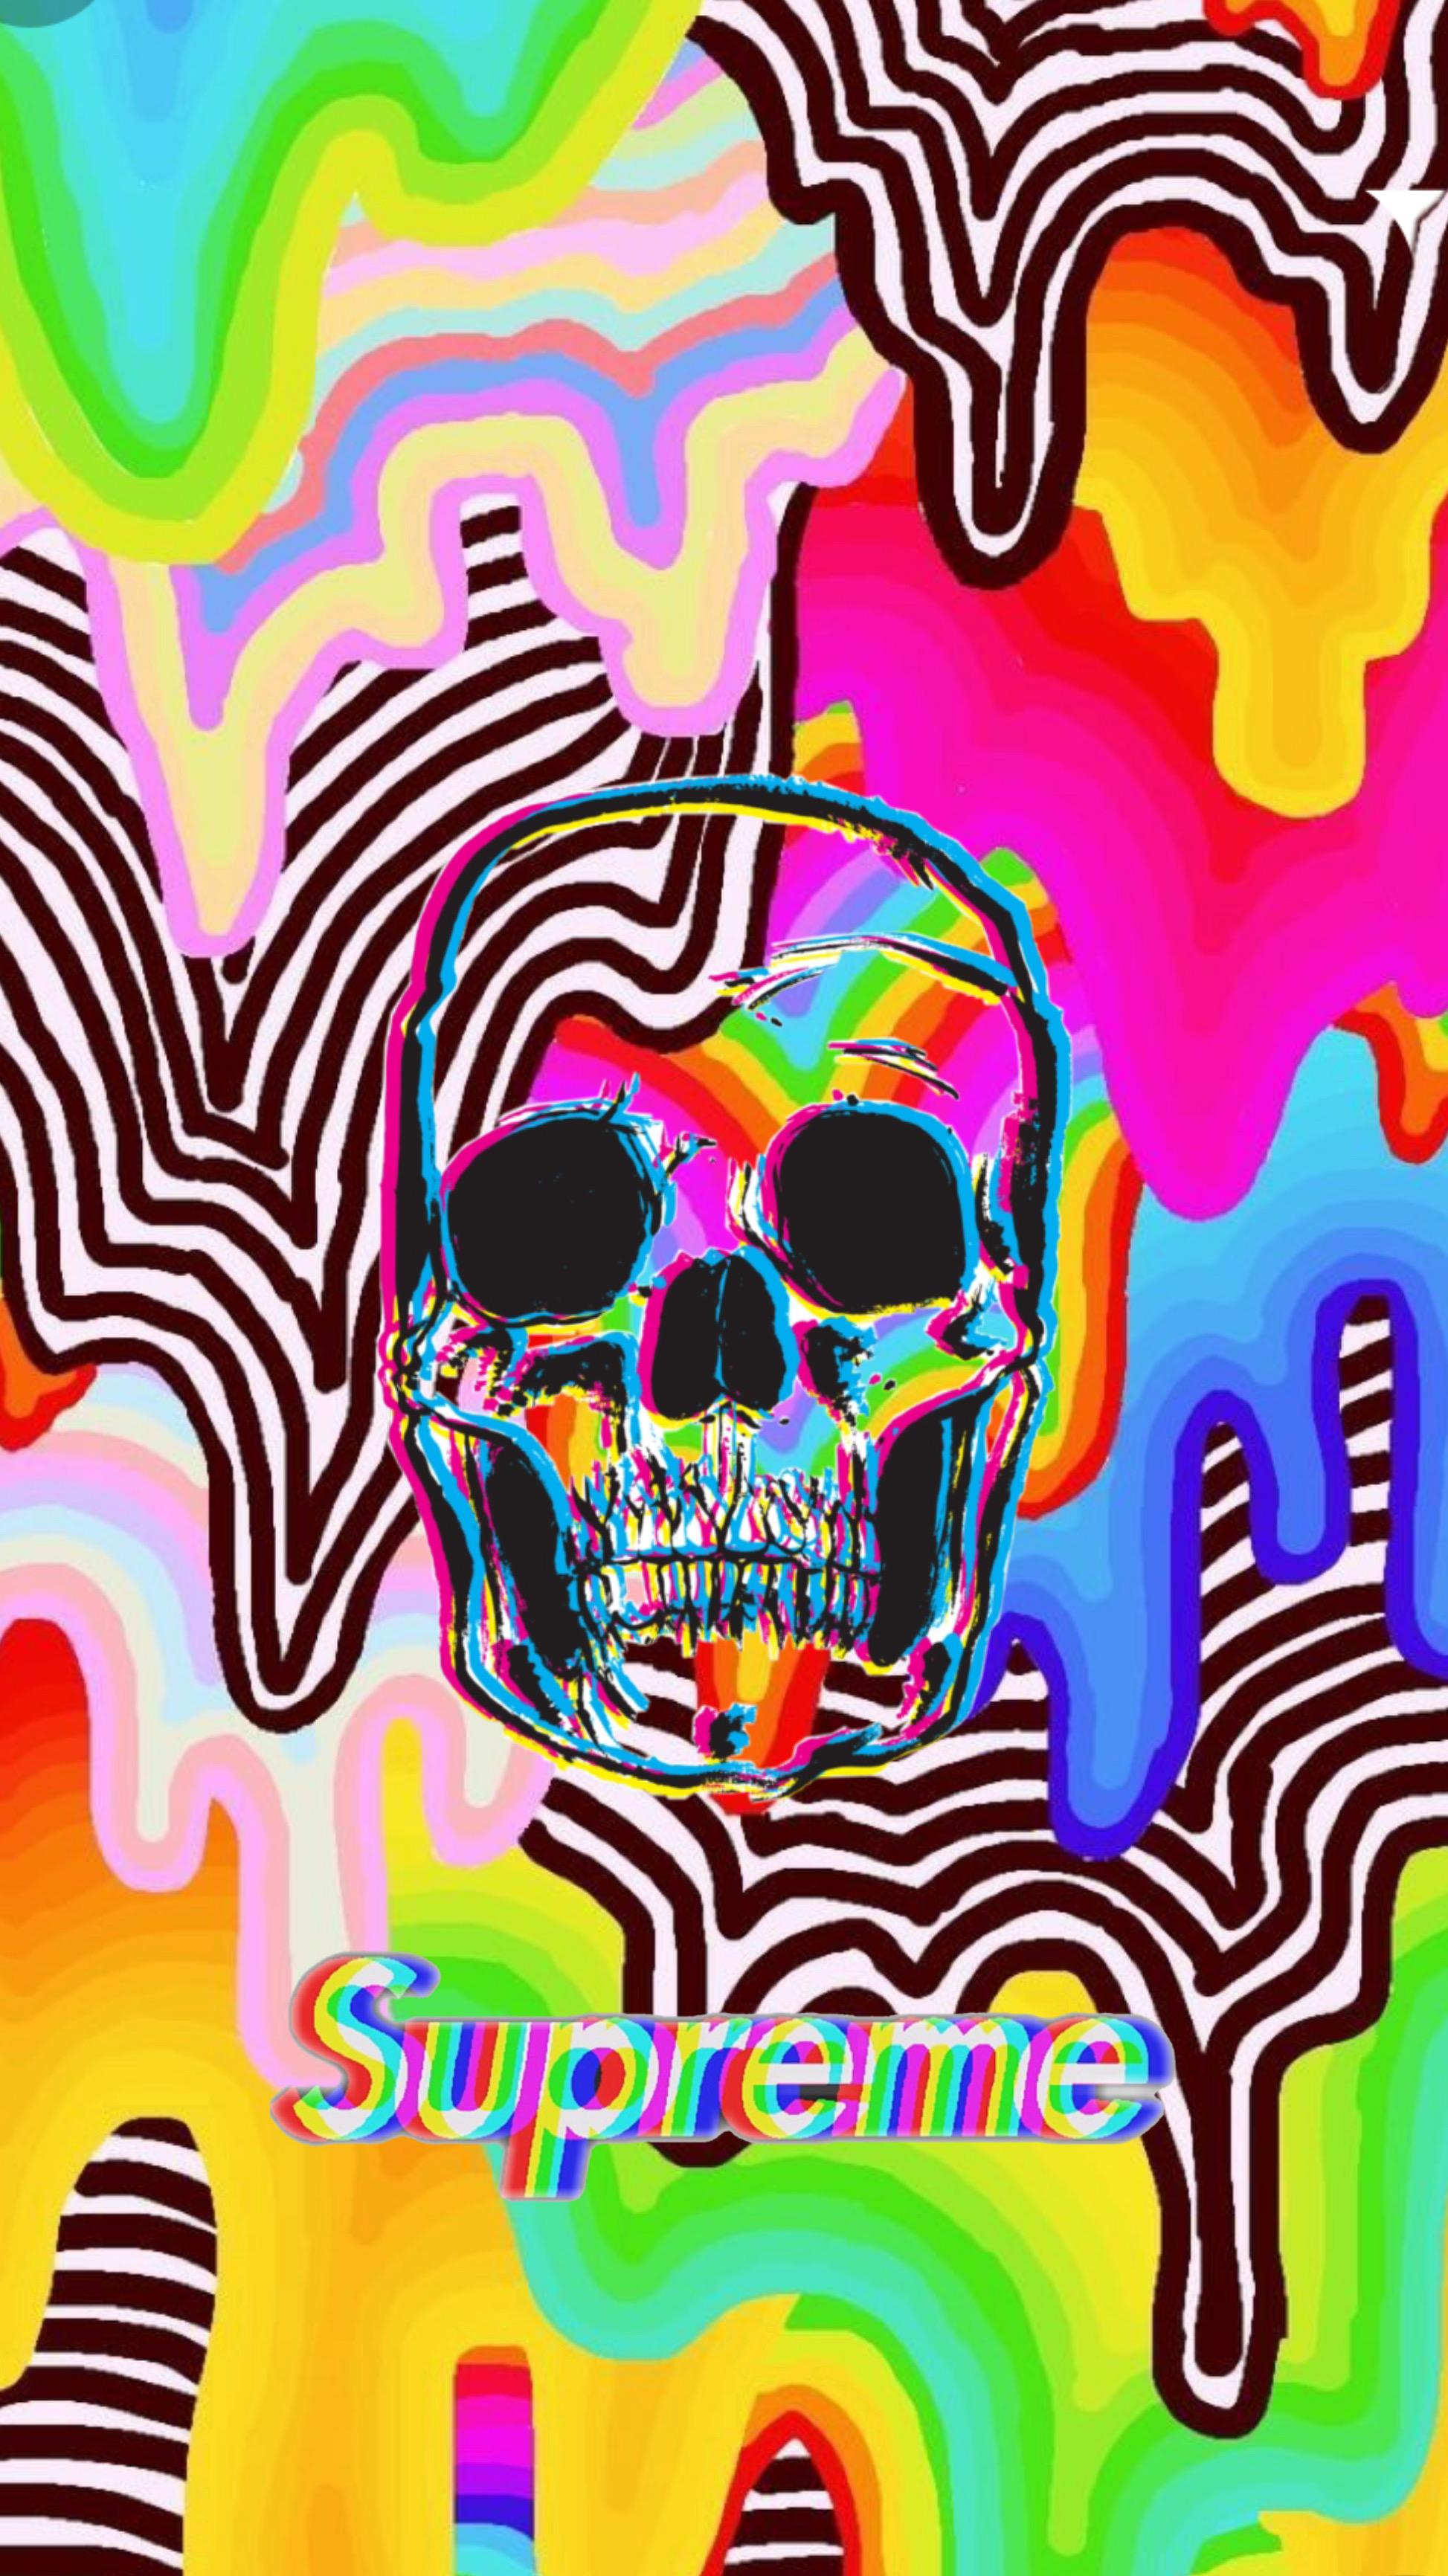 Trippy Supreme Wallpaper : trippy, supreme, wallpaper, Trippy, Skull, Supreme, Image